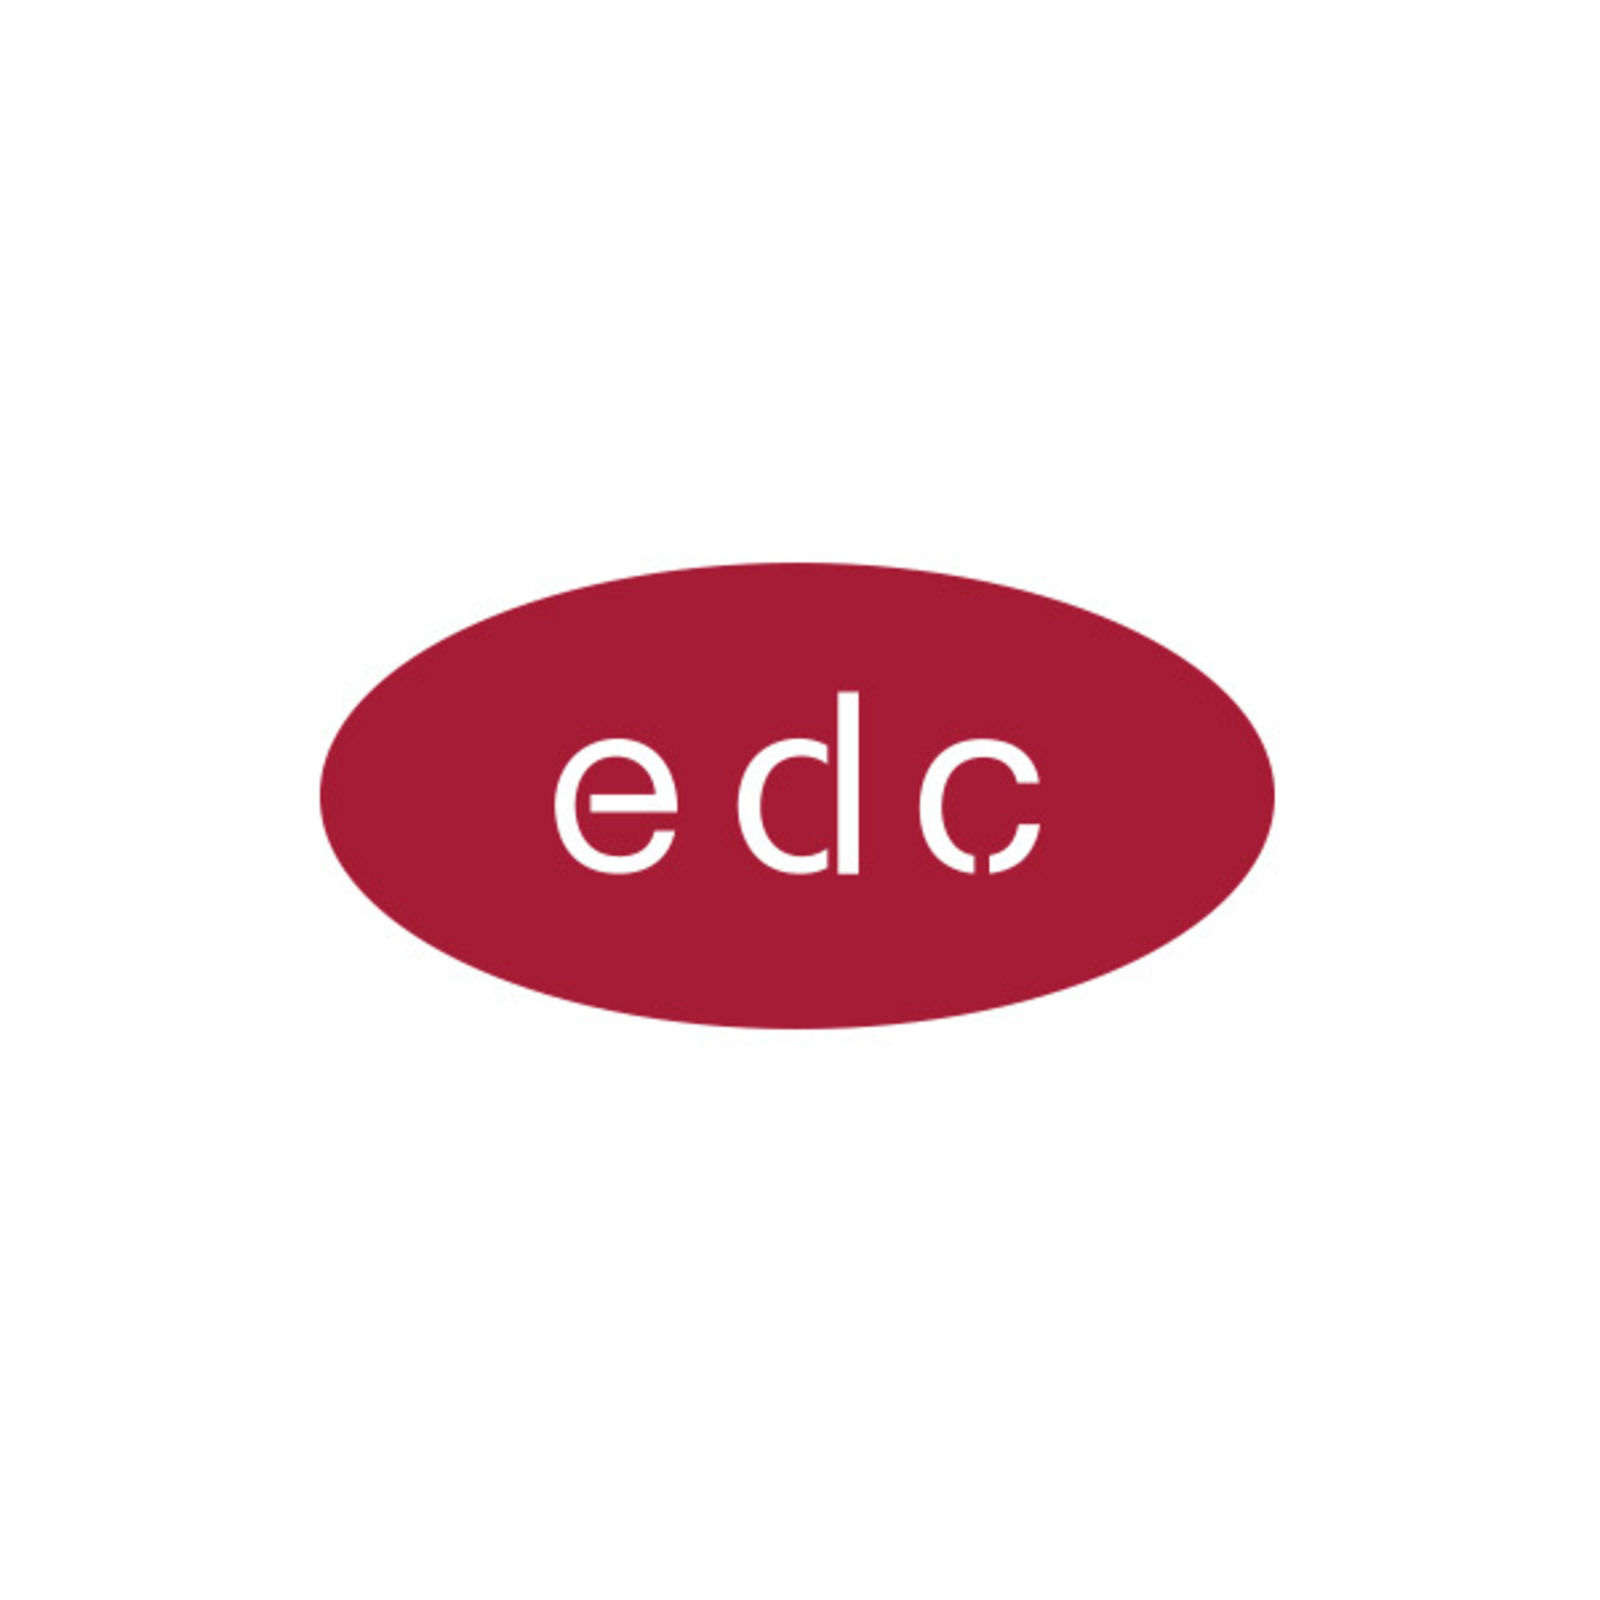 edc by ESPRIT (Bild 1)